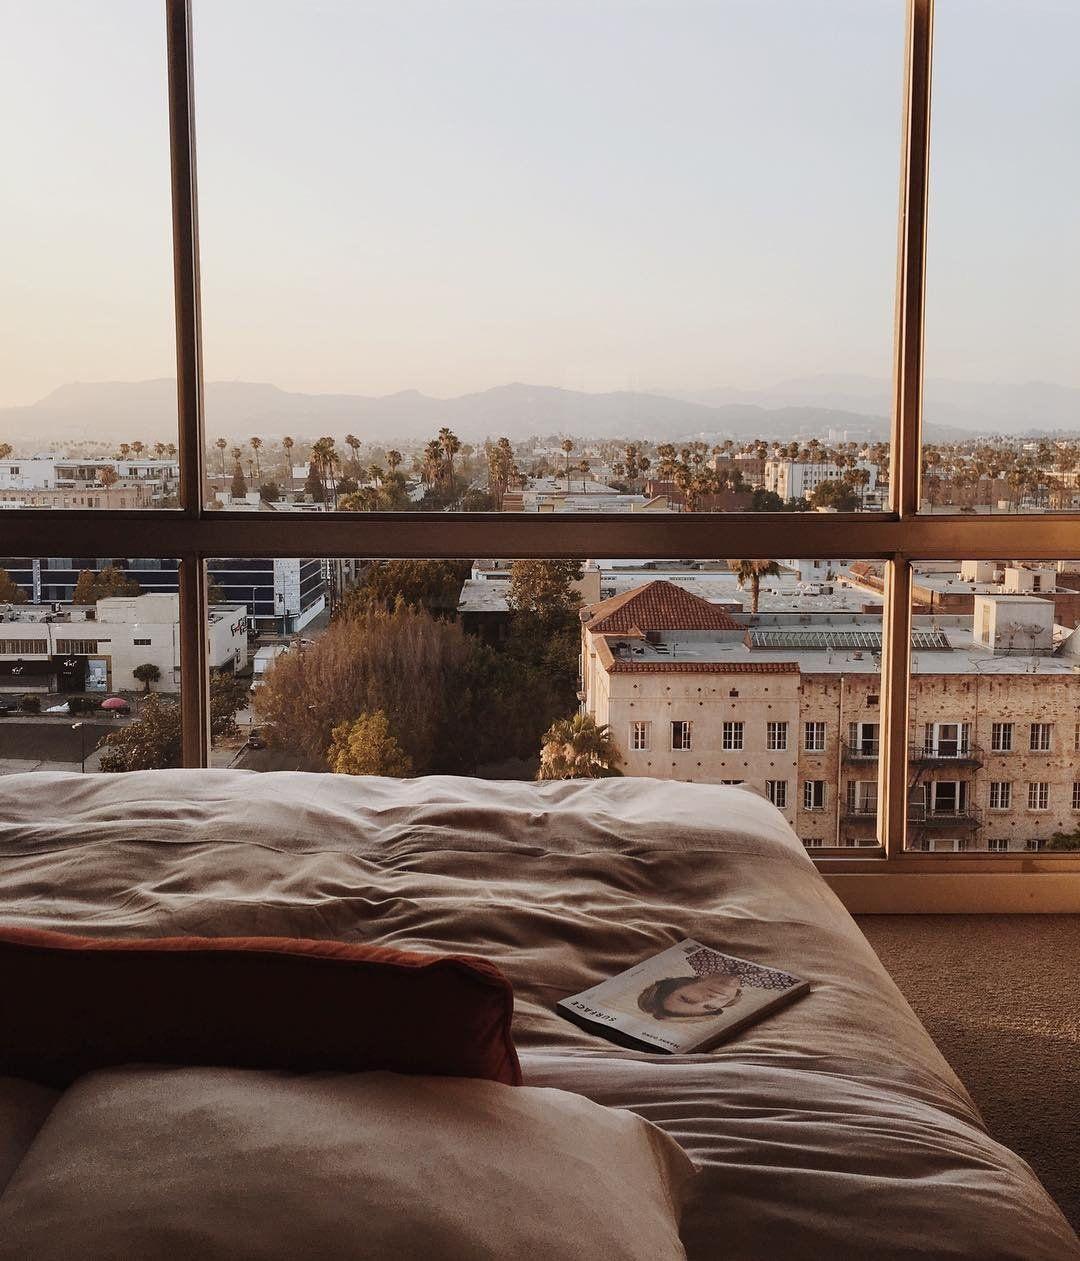 Los Angeles Apartments Near Airport: Tonya Smith (@themoptop) On